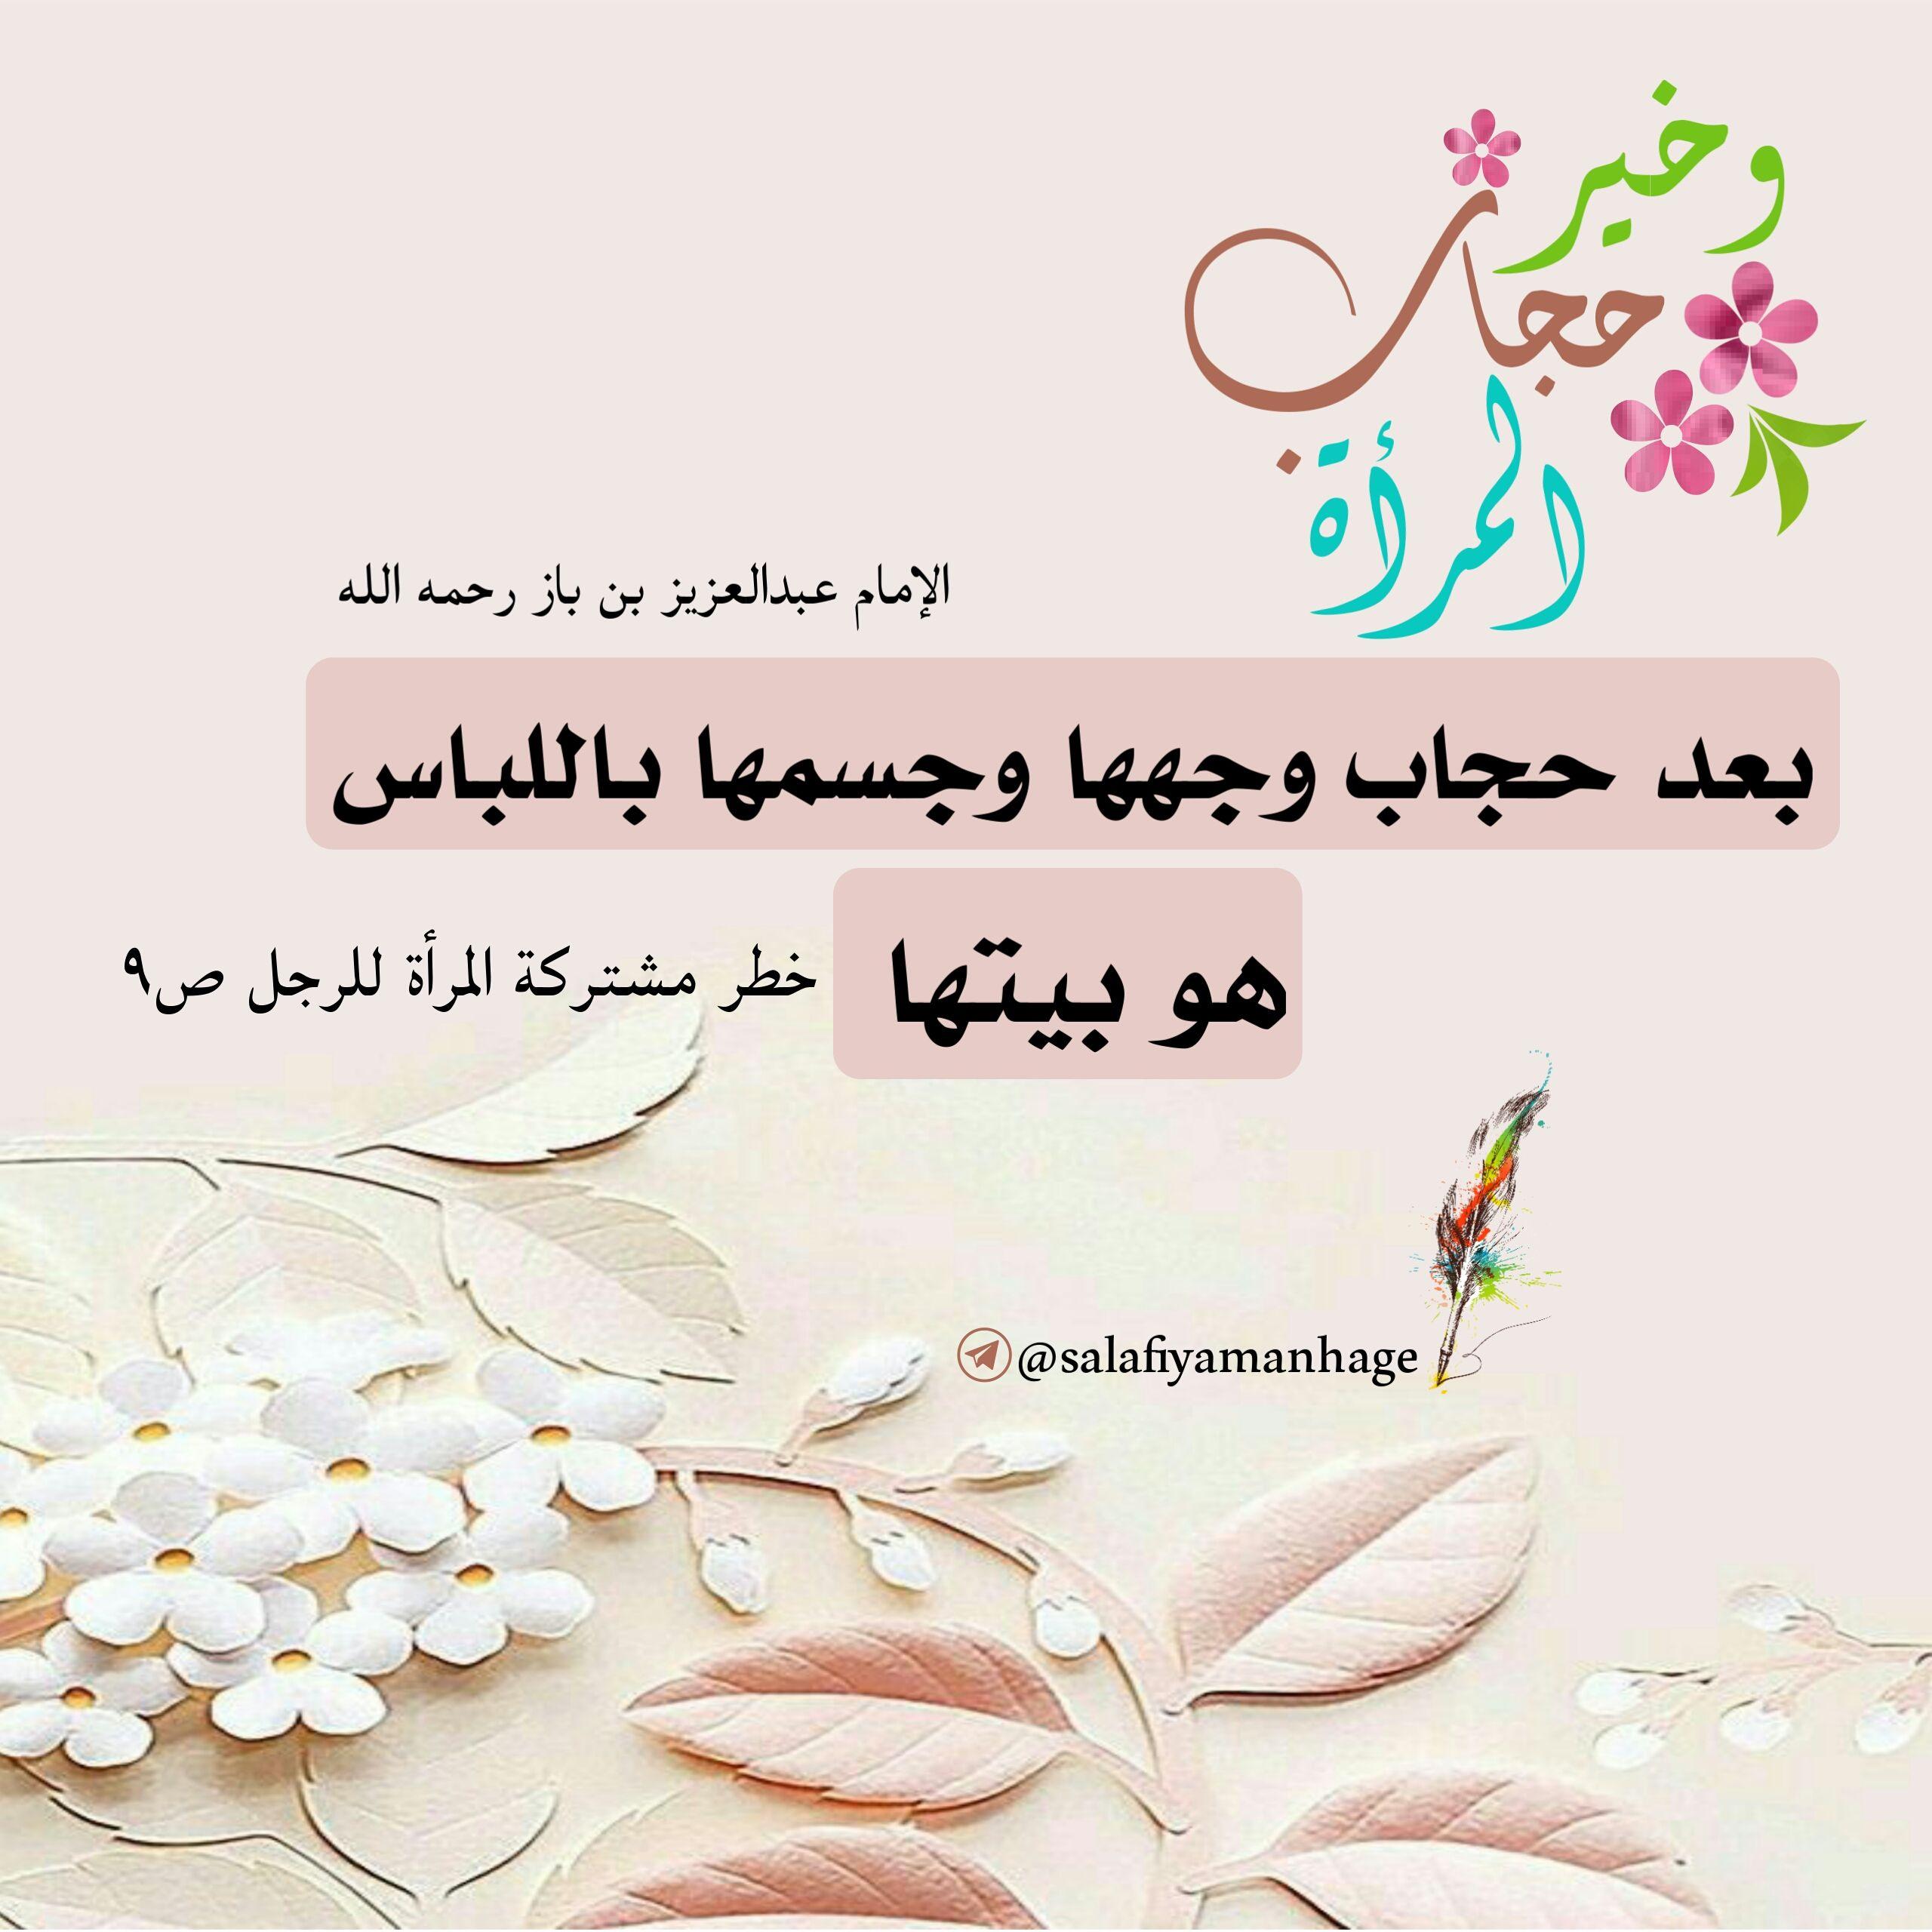 Pin By المرأة المسلمة On مواعظ ونصائح للأخوات Place Card Holders Place Cards Cards